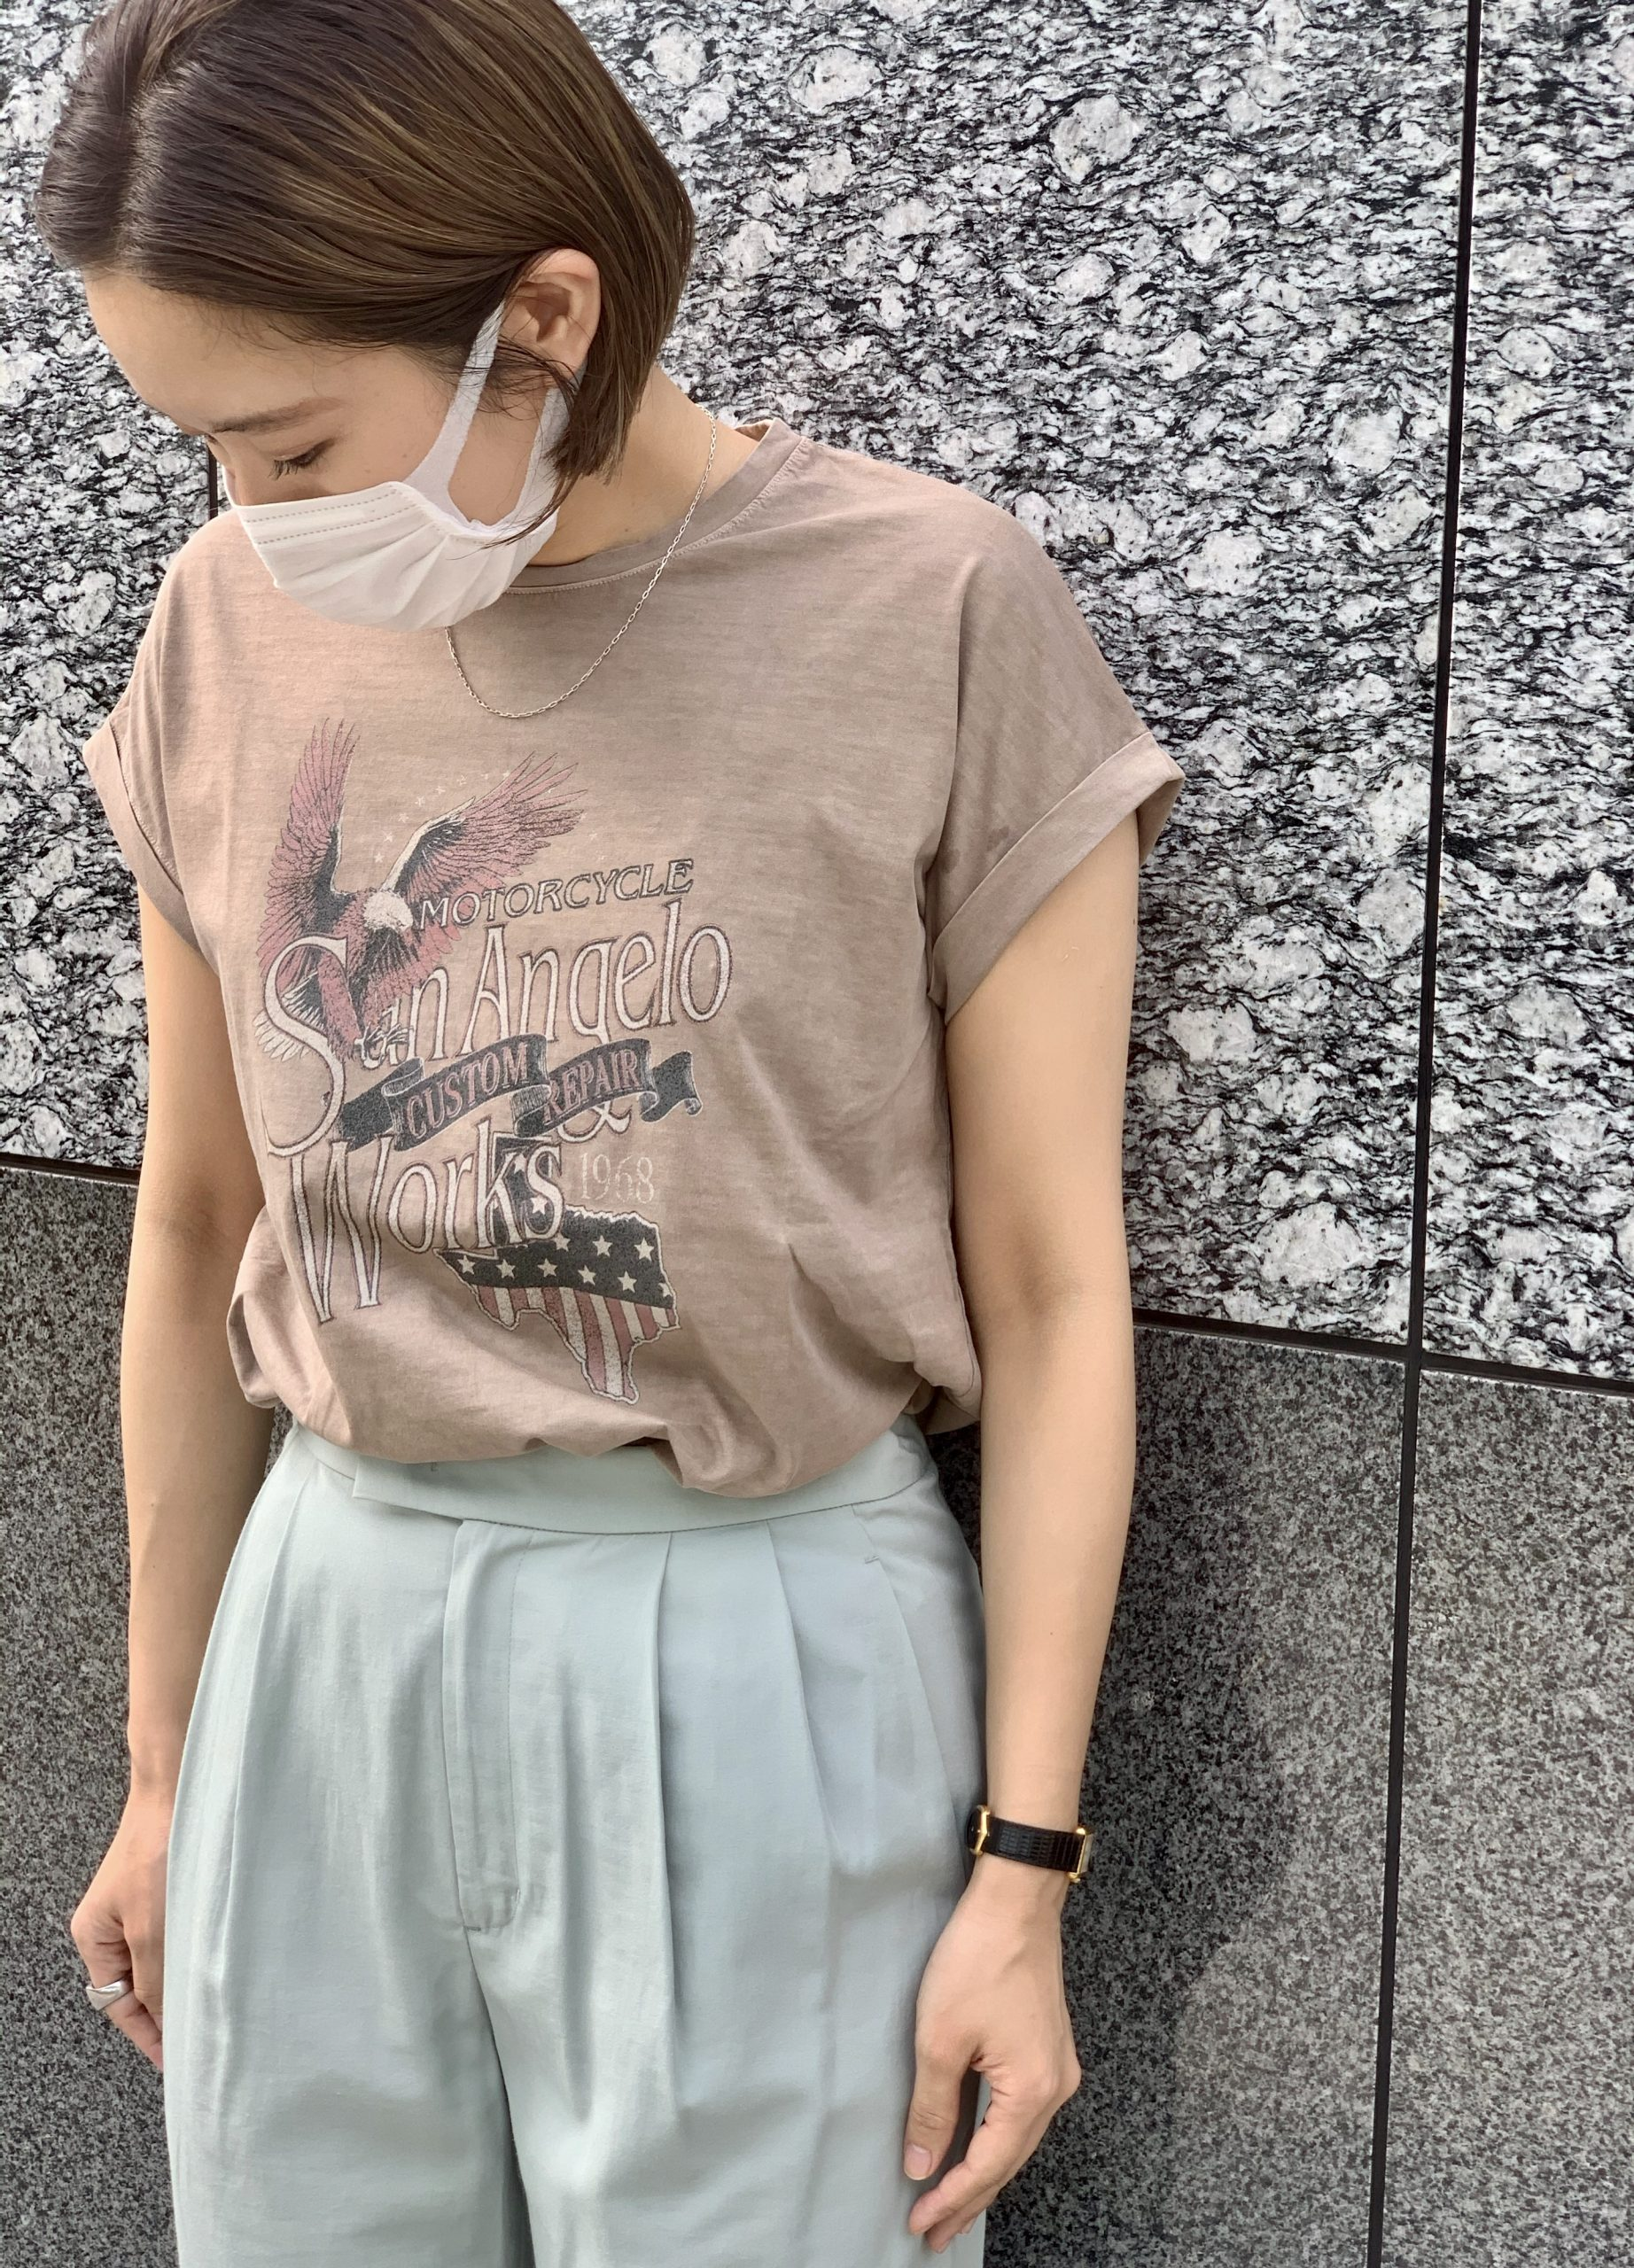 MICA & DEAL eagle rock t-shirt ¥9,000+税